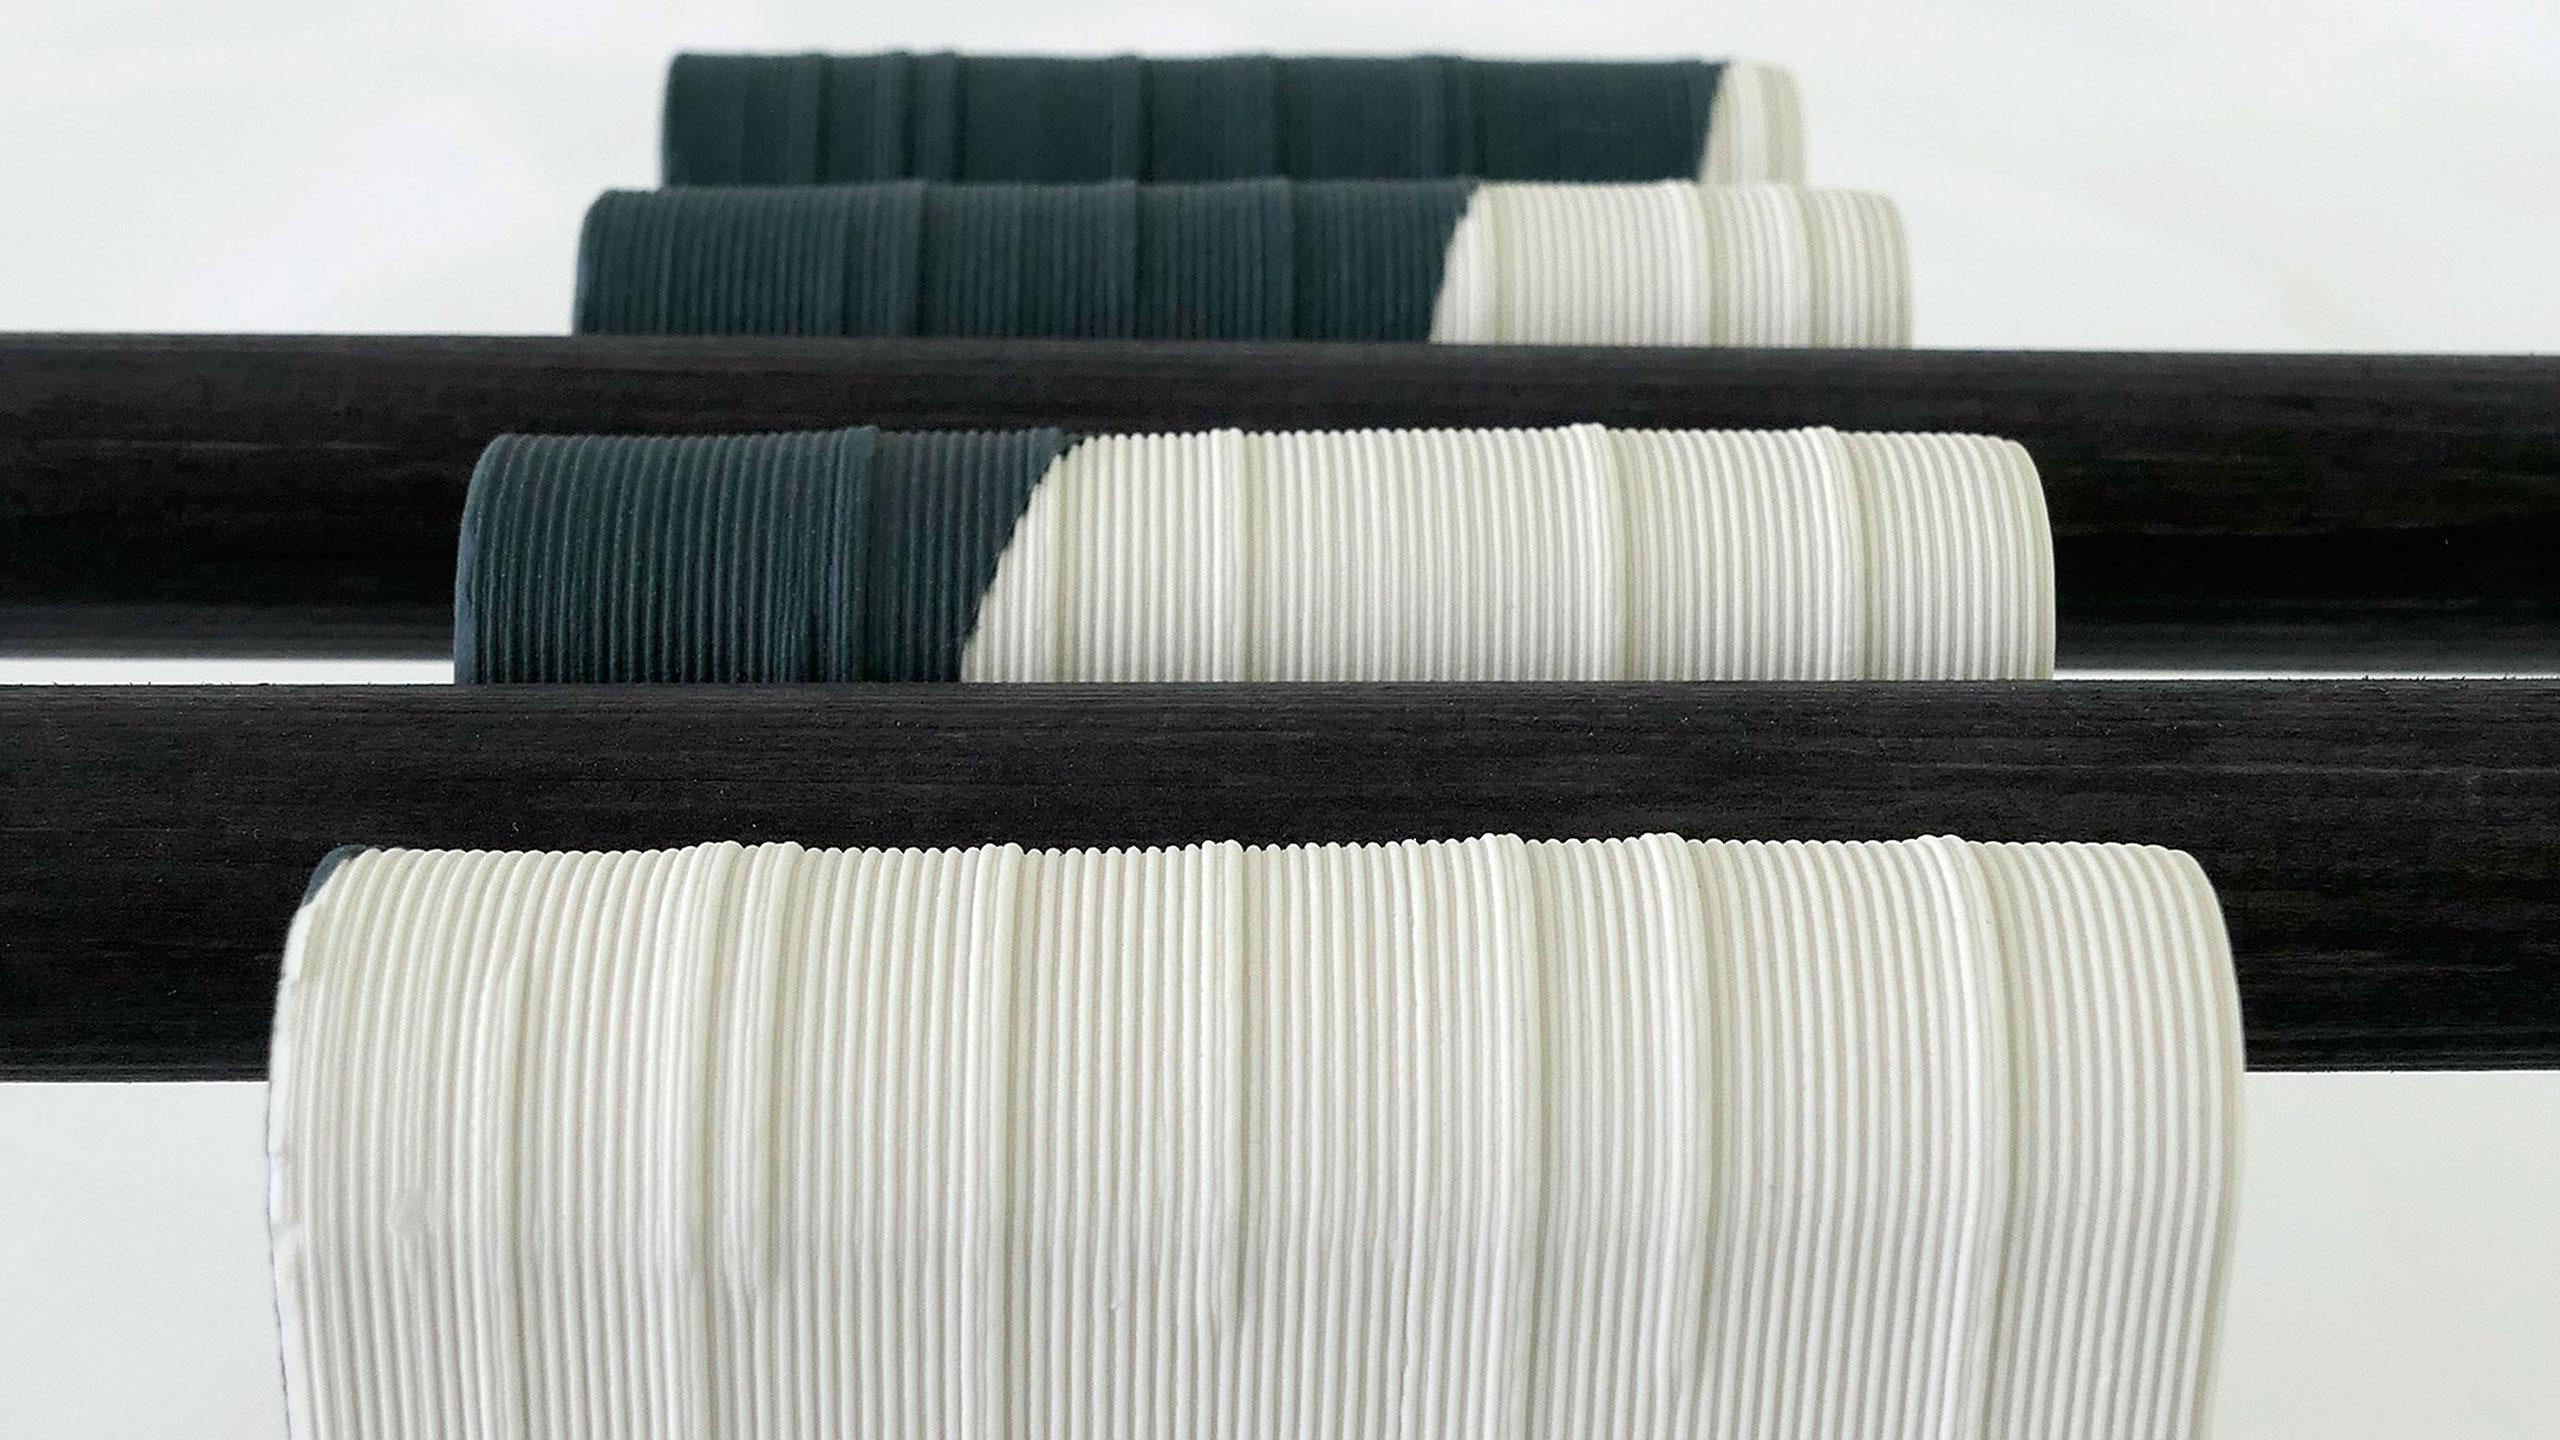 3d-printad keramik av Hilda Nilsson